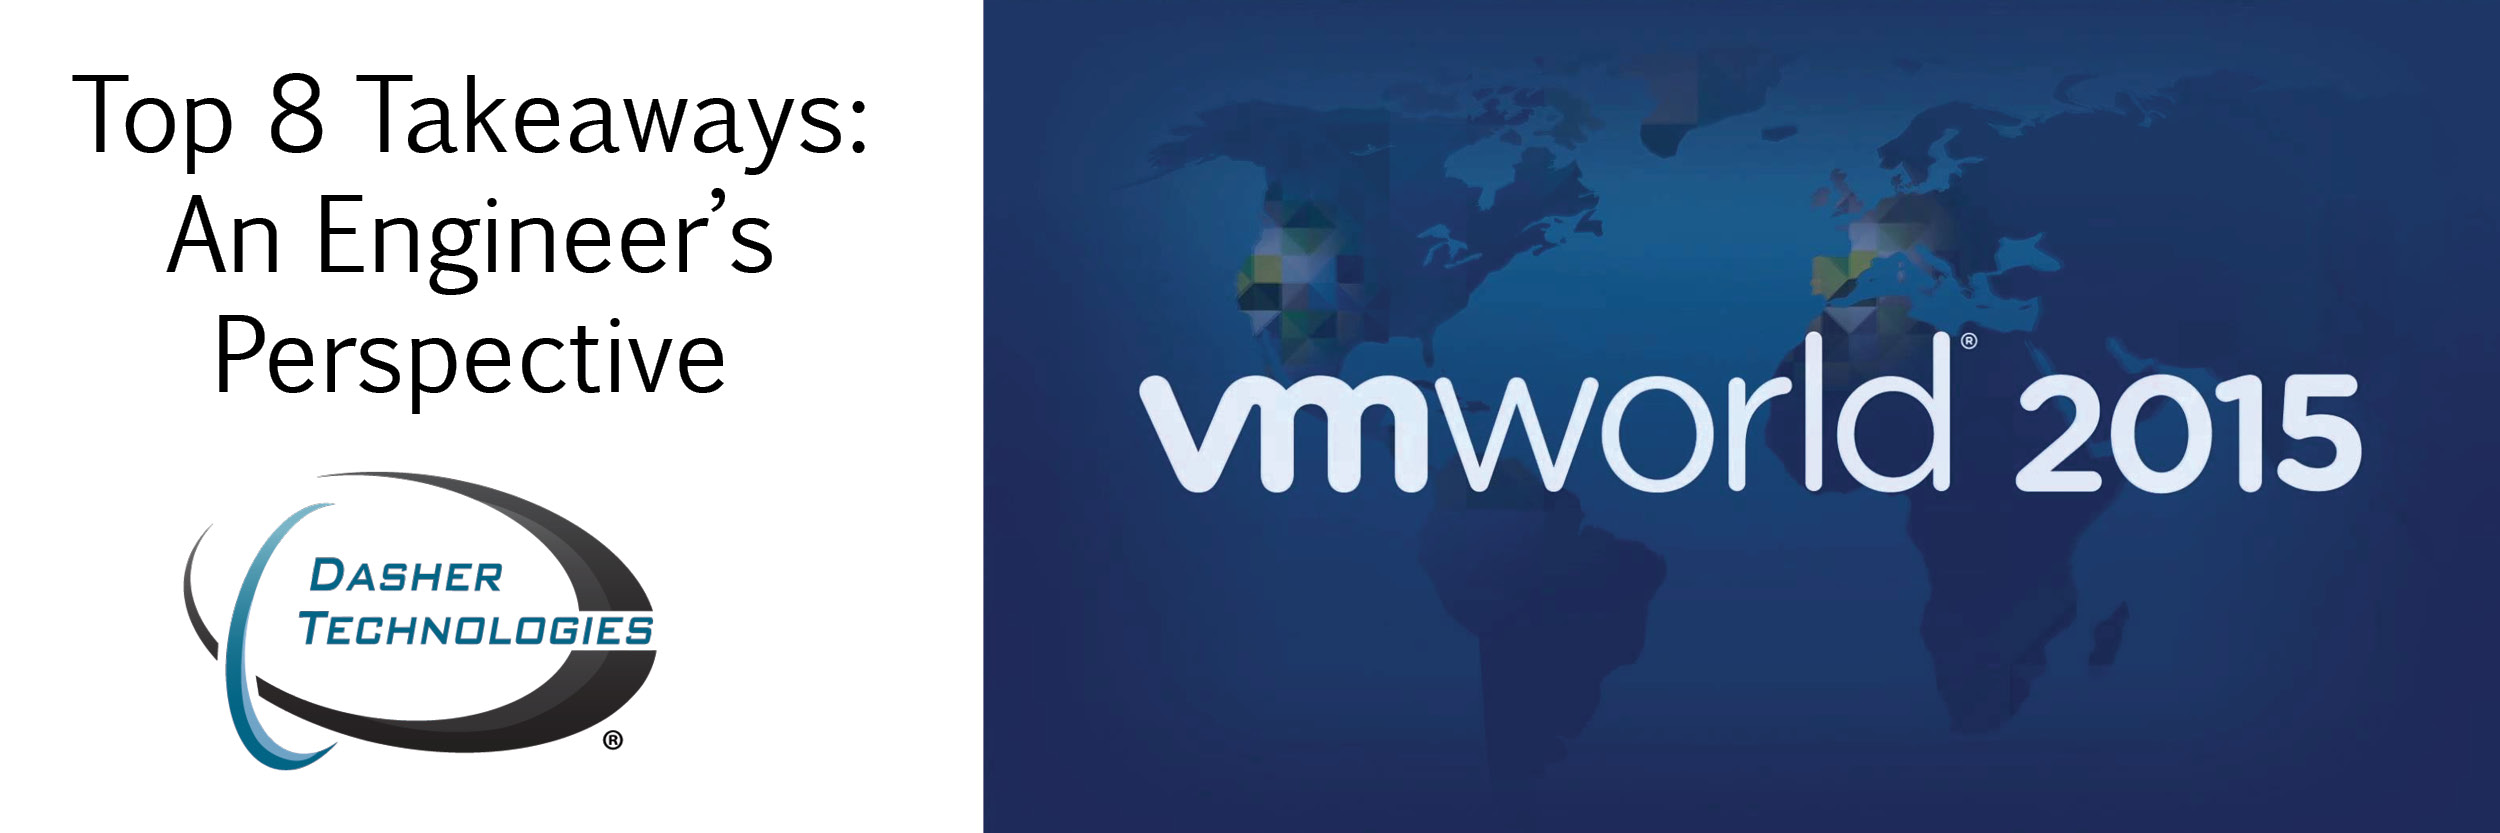 VMworld Top 8 Takeaways: An Engineer's Perspective